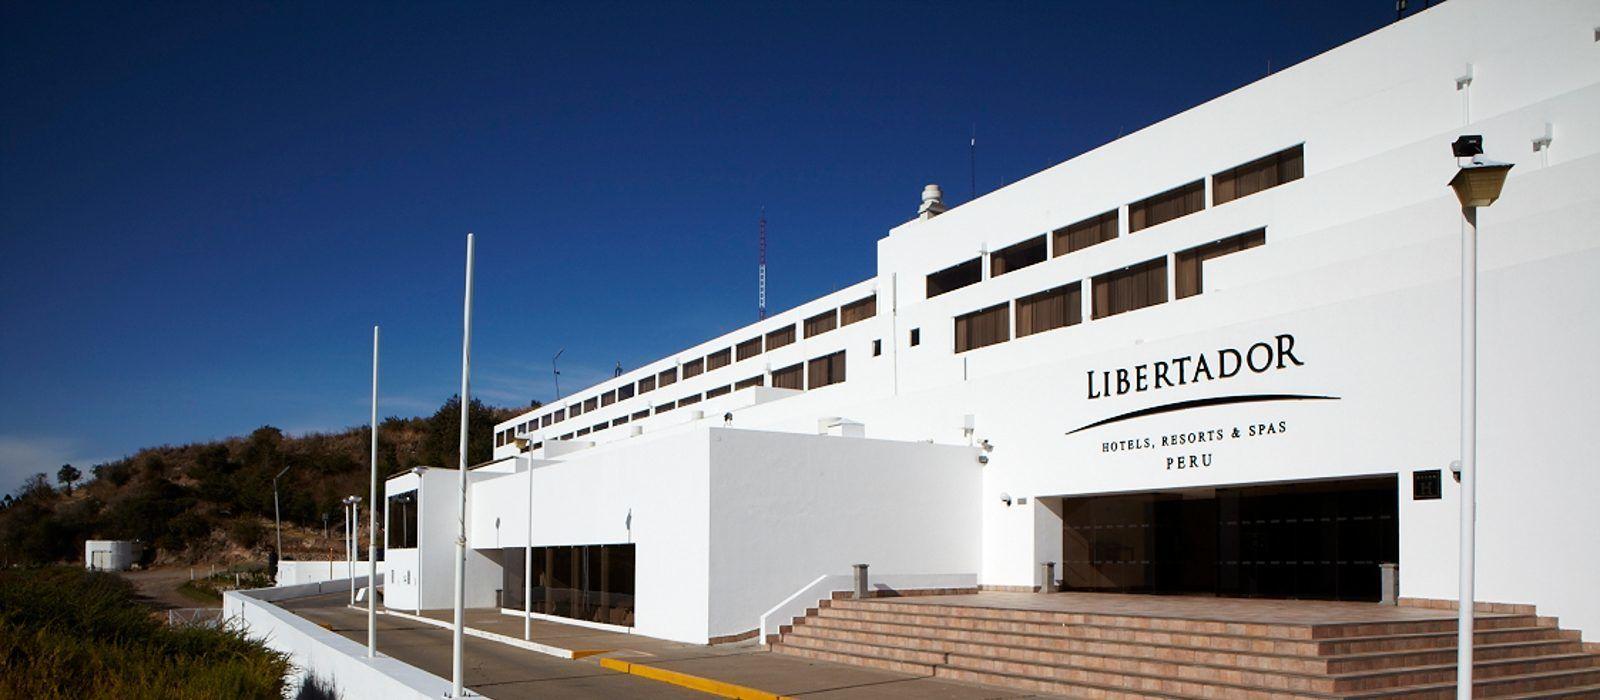 Hotel Libertador Lago Titicaca Peru